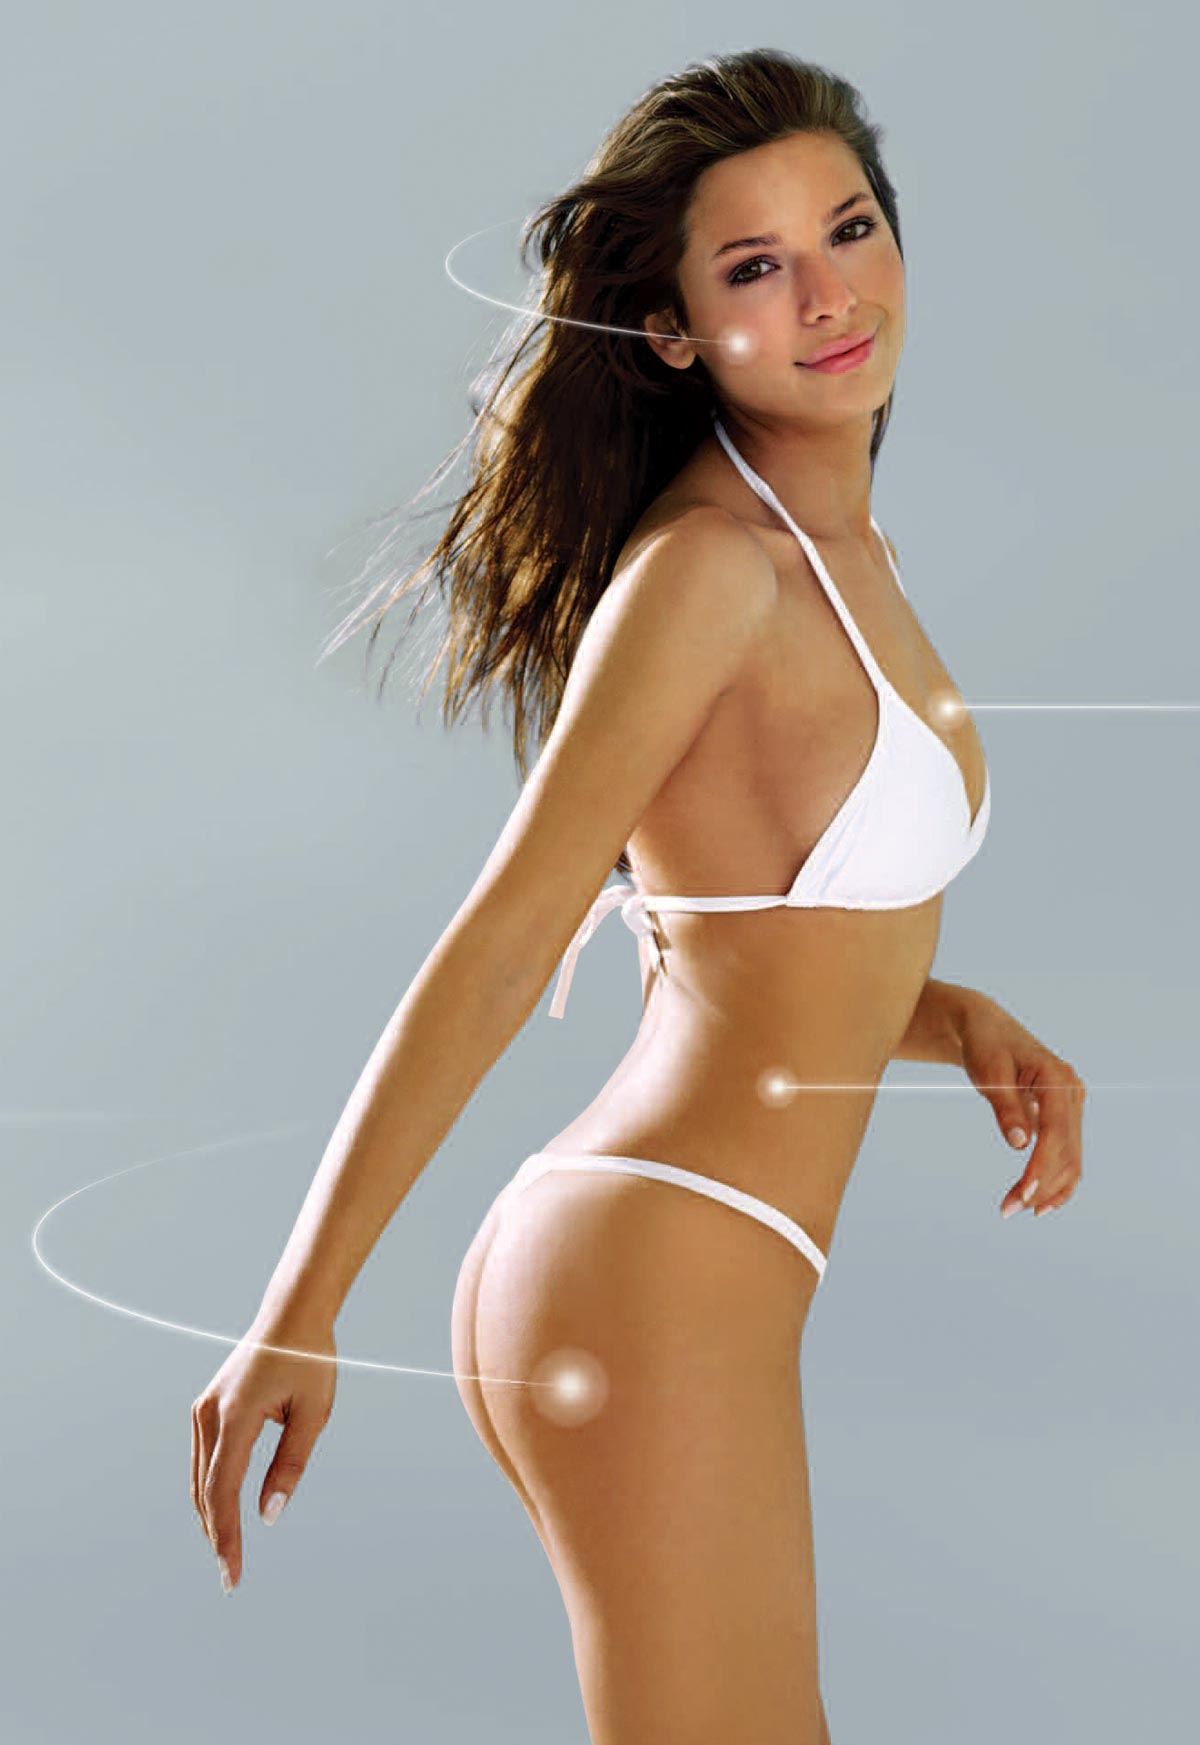 silueta femeie tonifiata biostimulare Ultratone Excel Pro